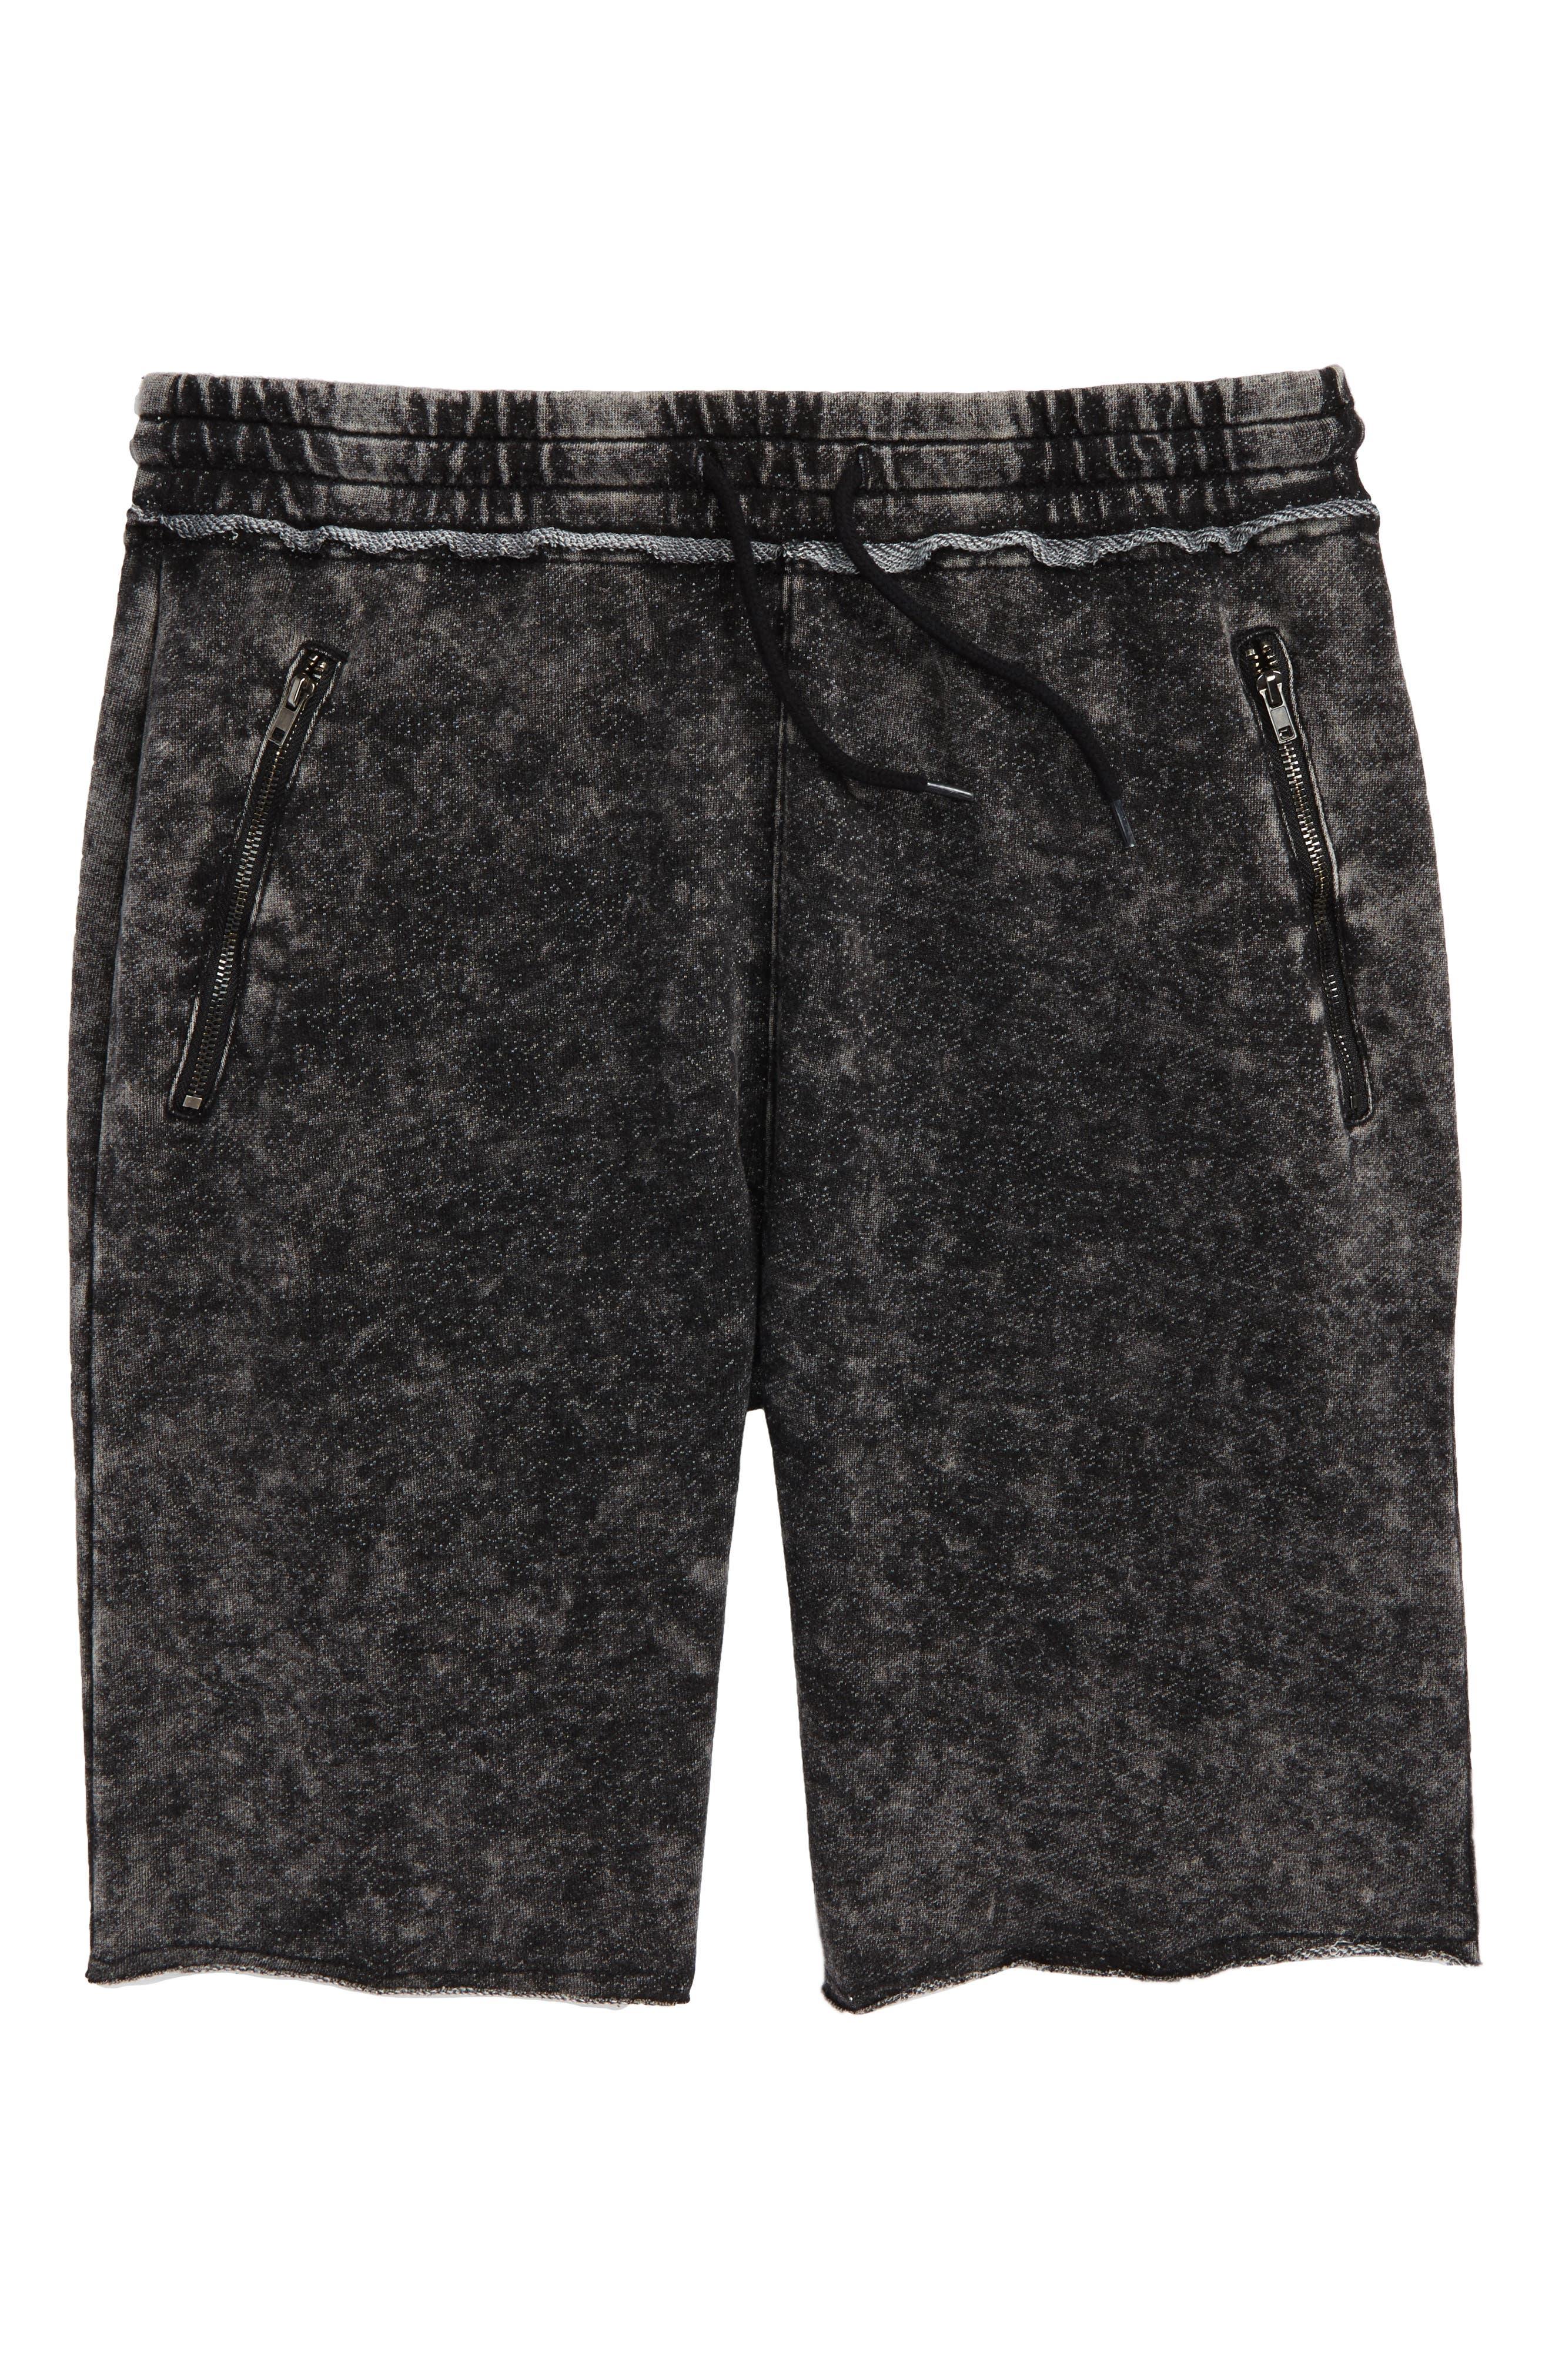 5th and Ryder Raw Edge Knit Shorts (Big Boys)